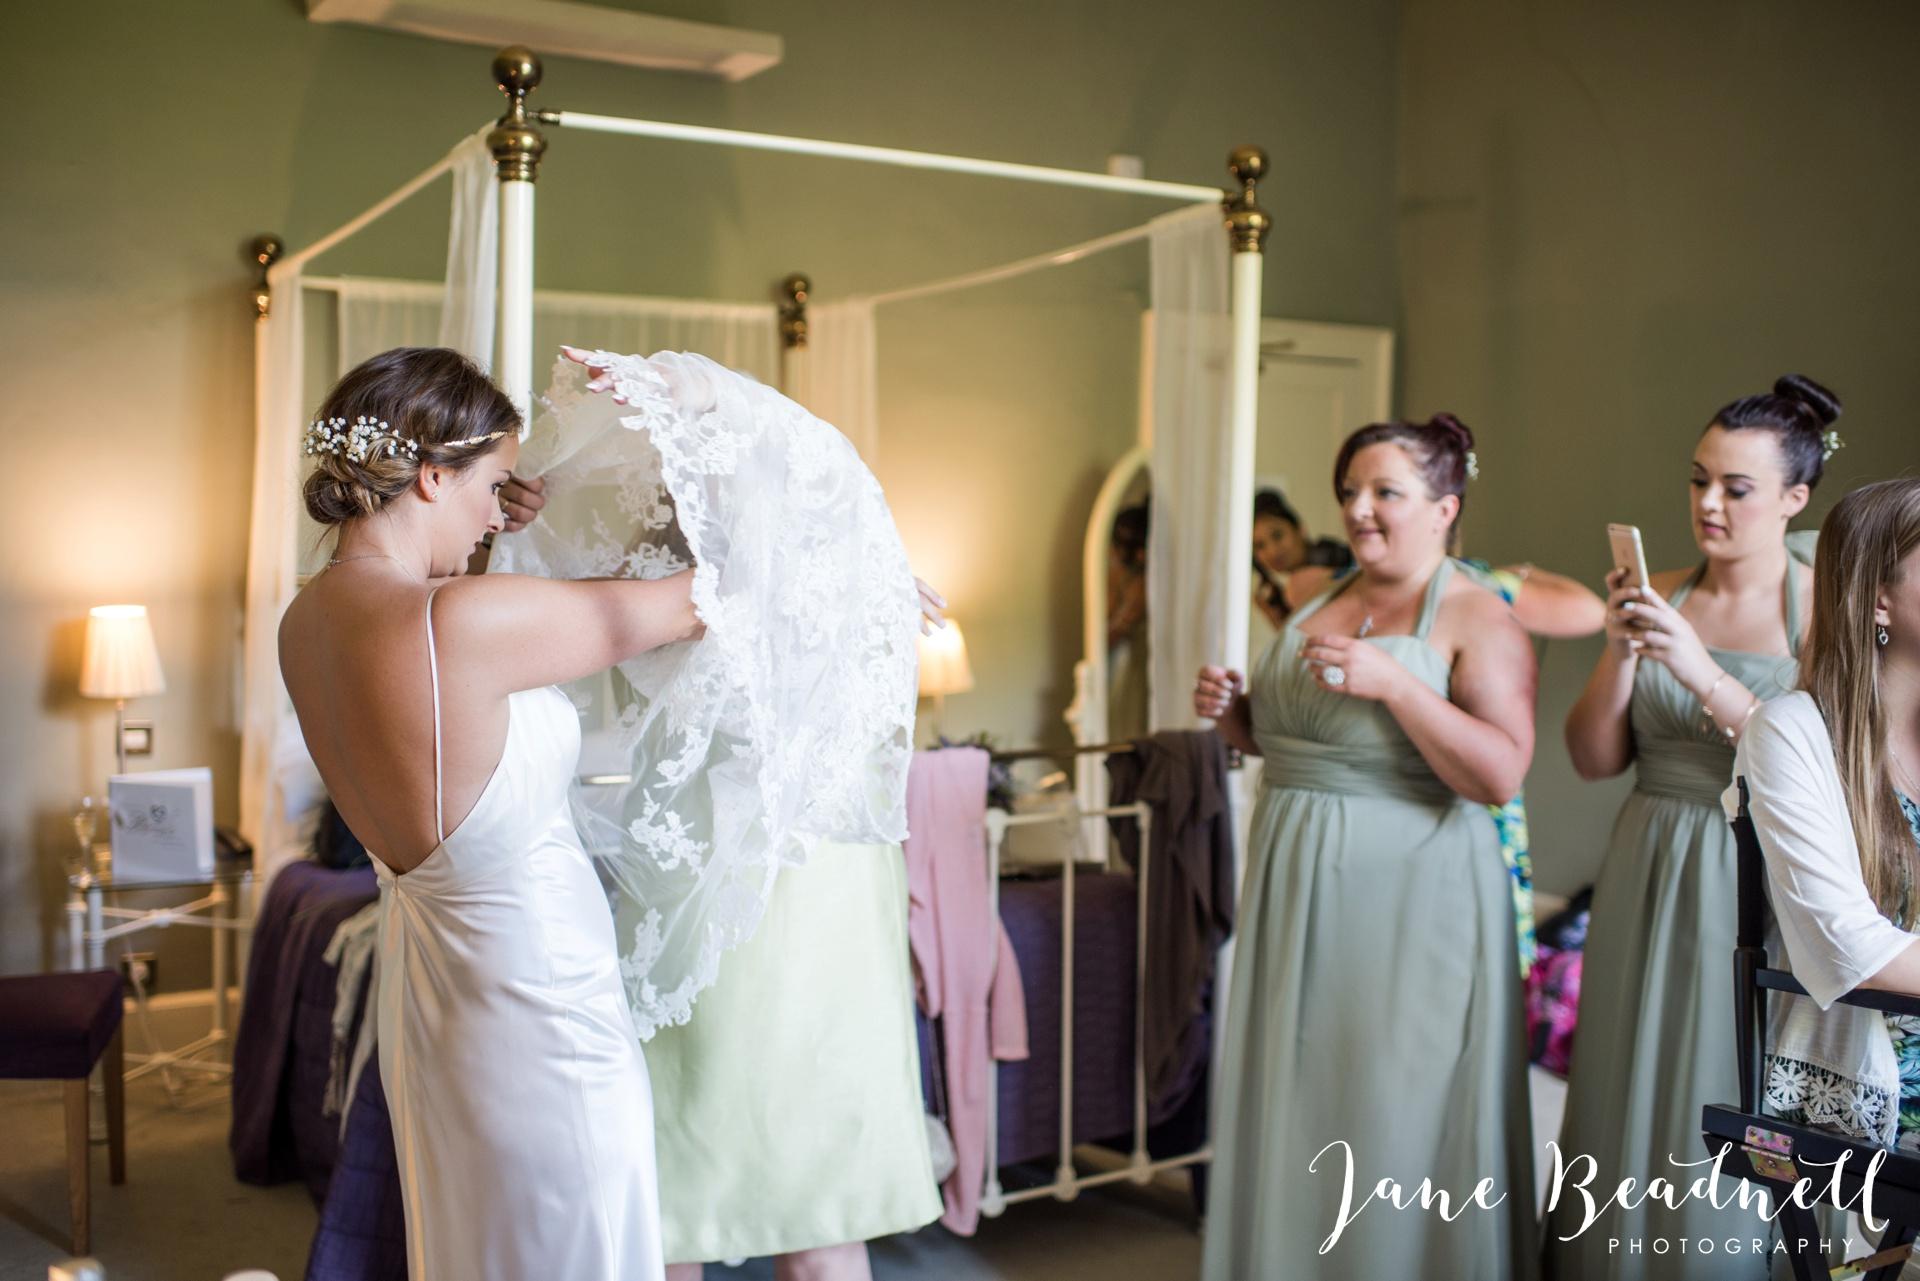 Jane Beadnell fine art wedding photographer The Old Deanery Ripon_0014